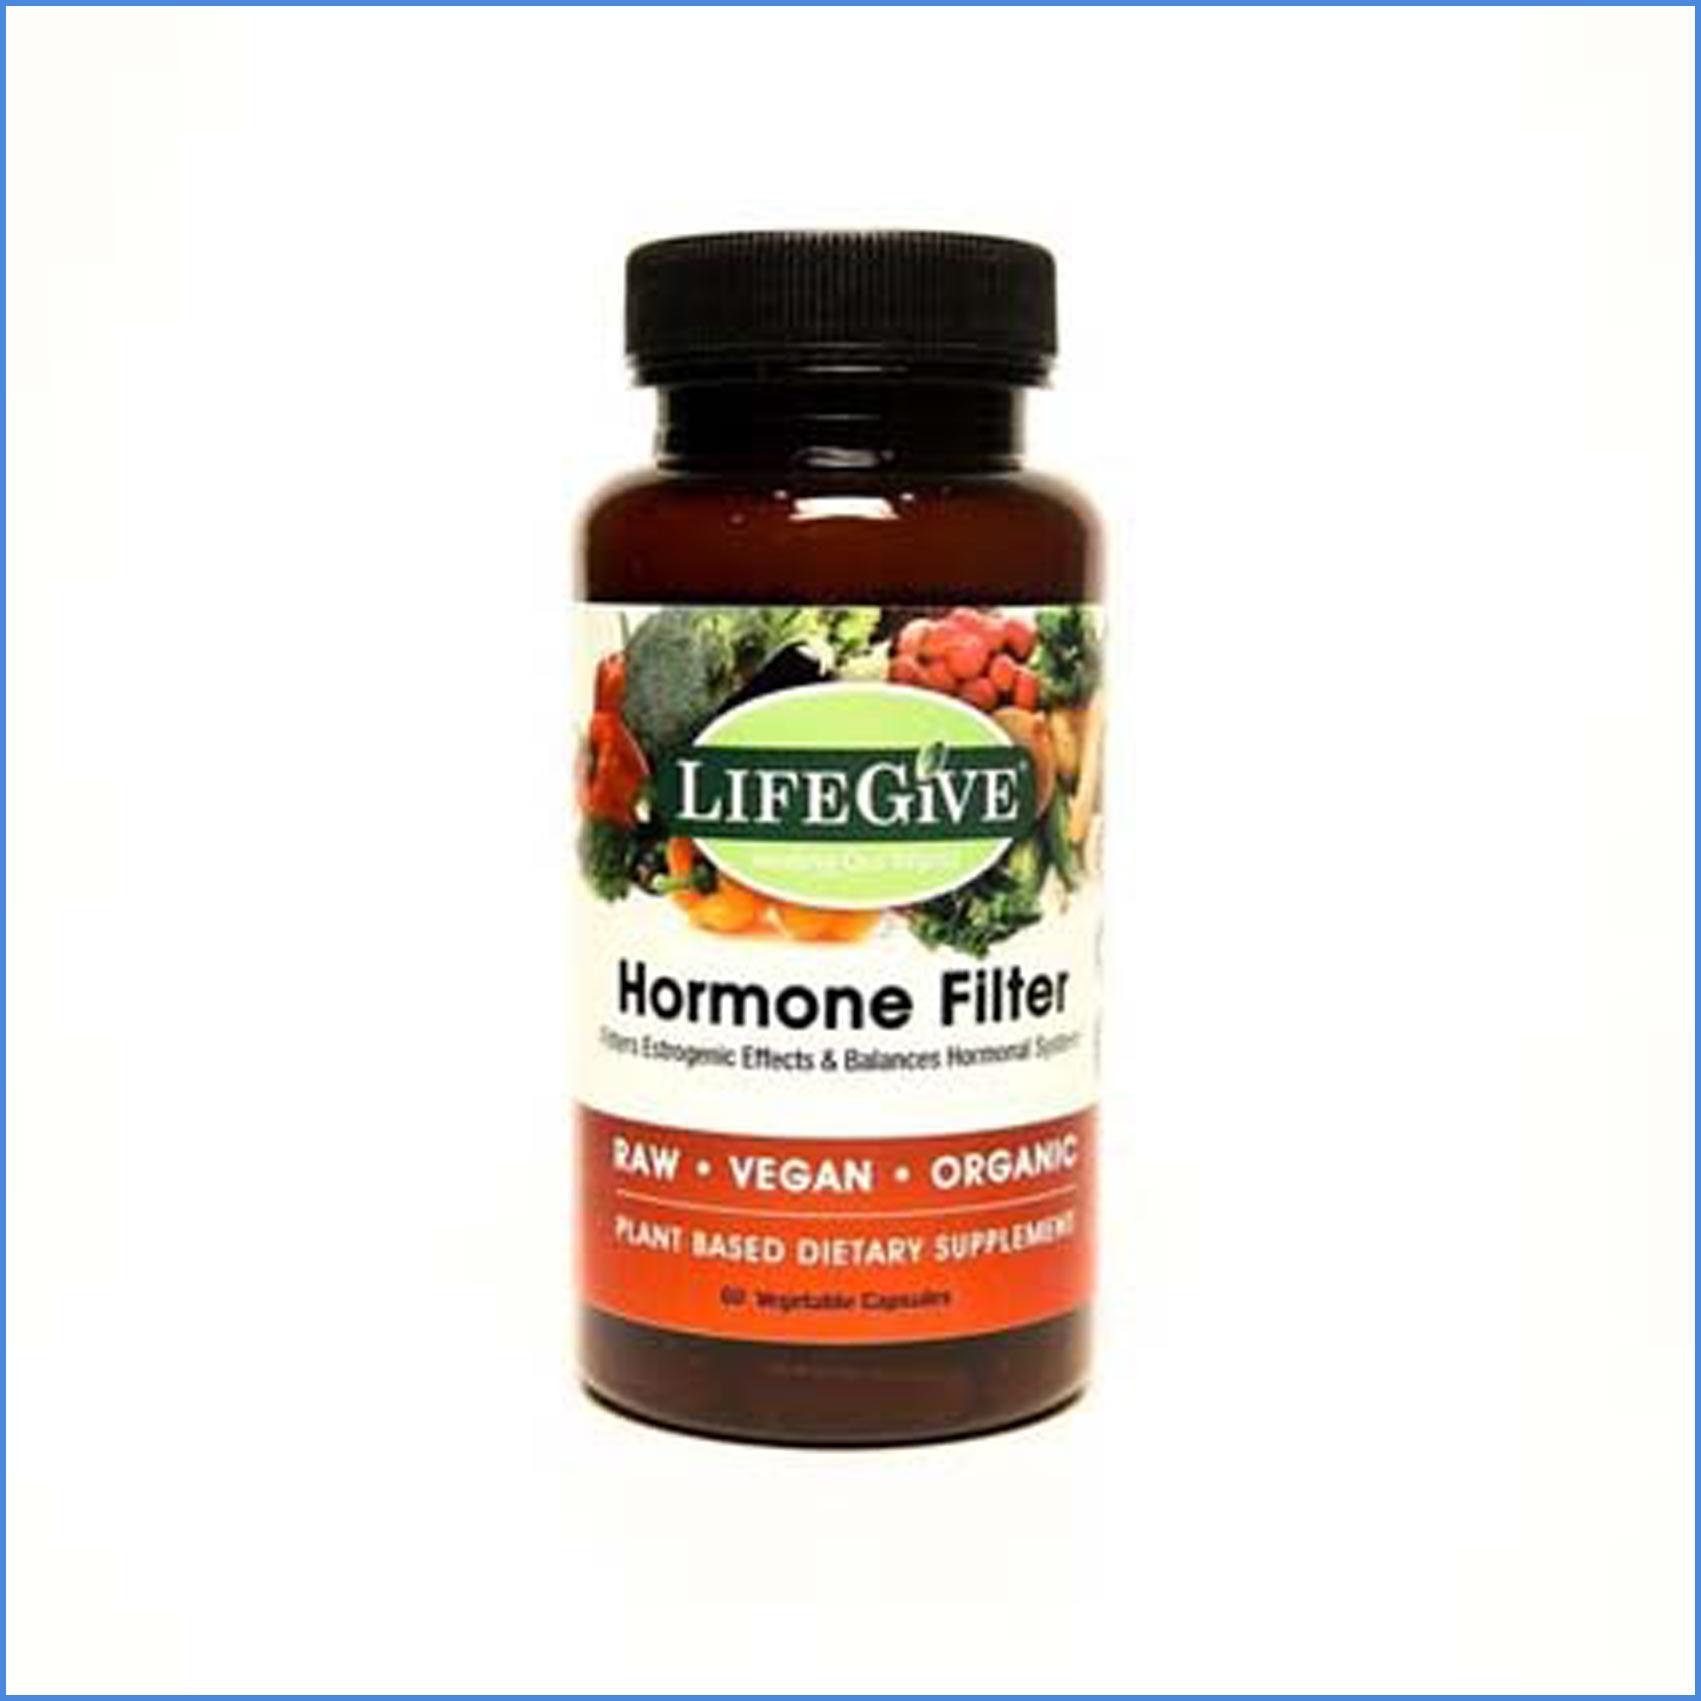 LifeGive Hormone Filter